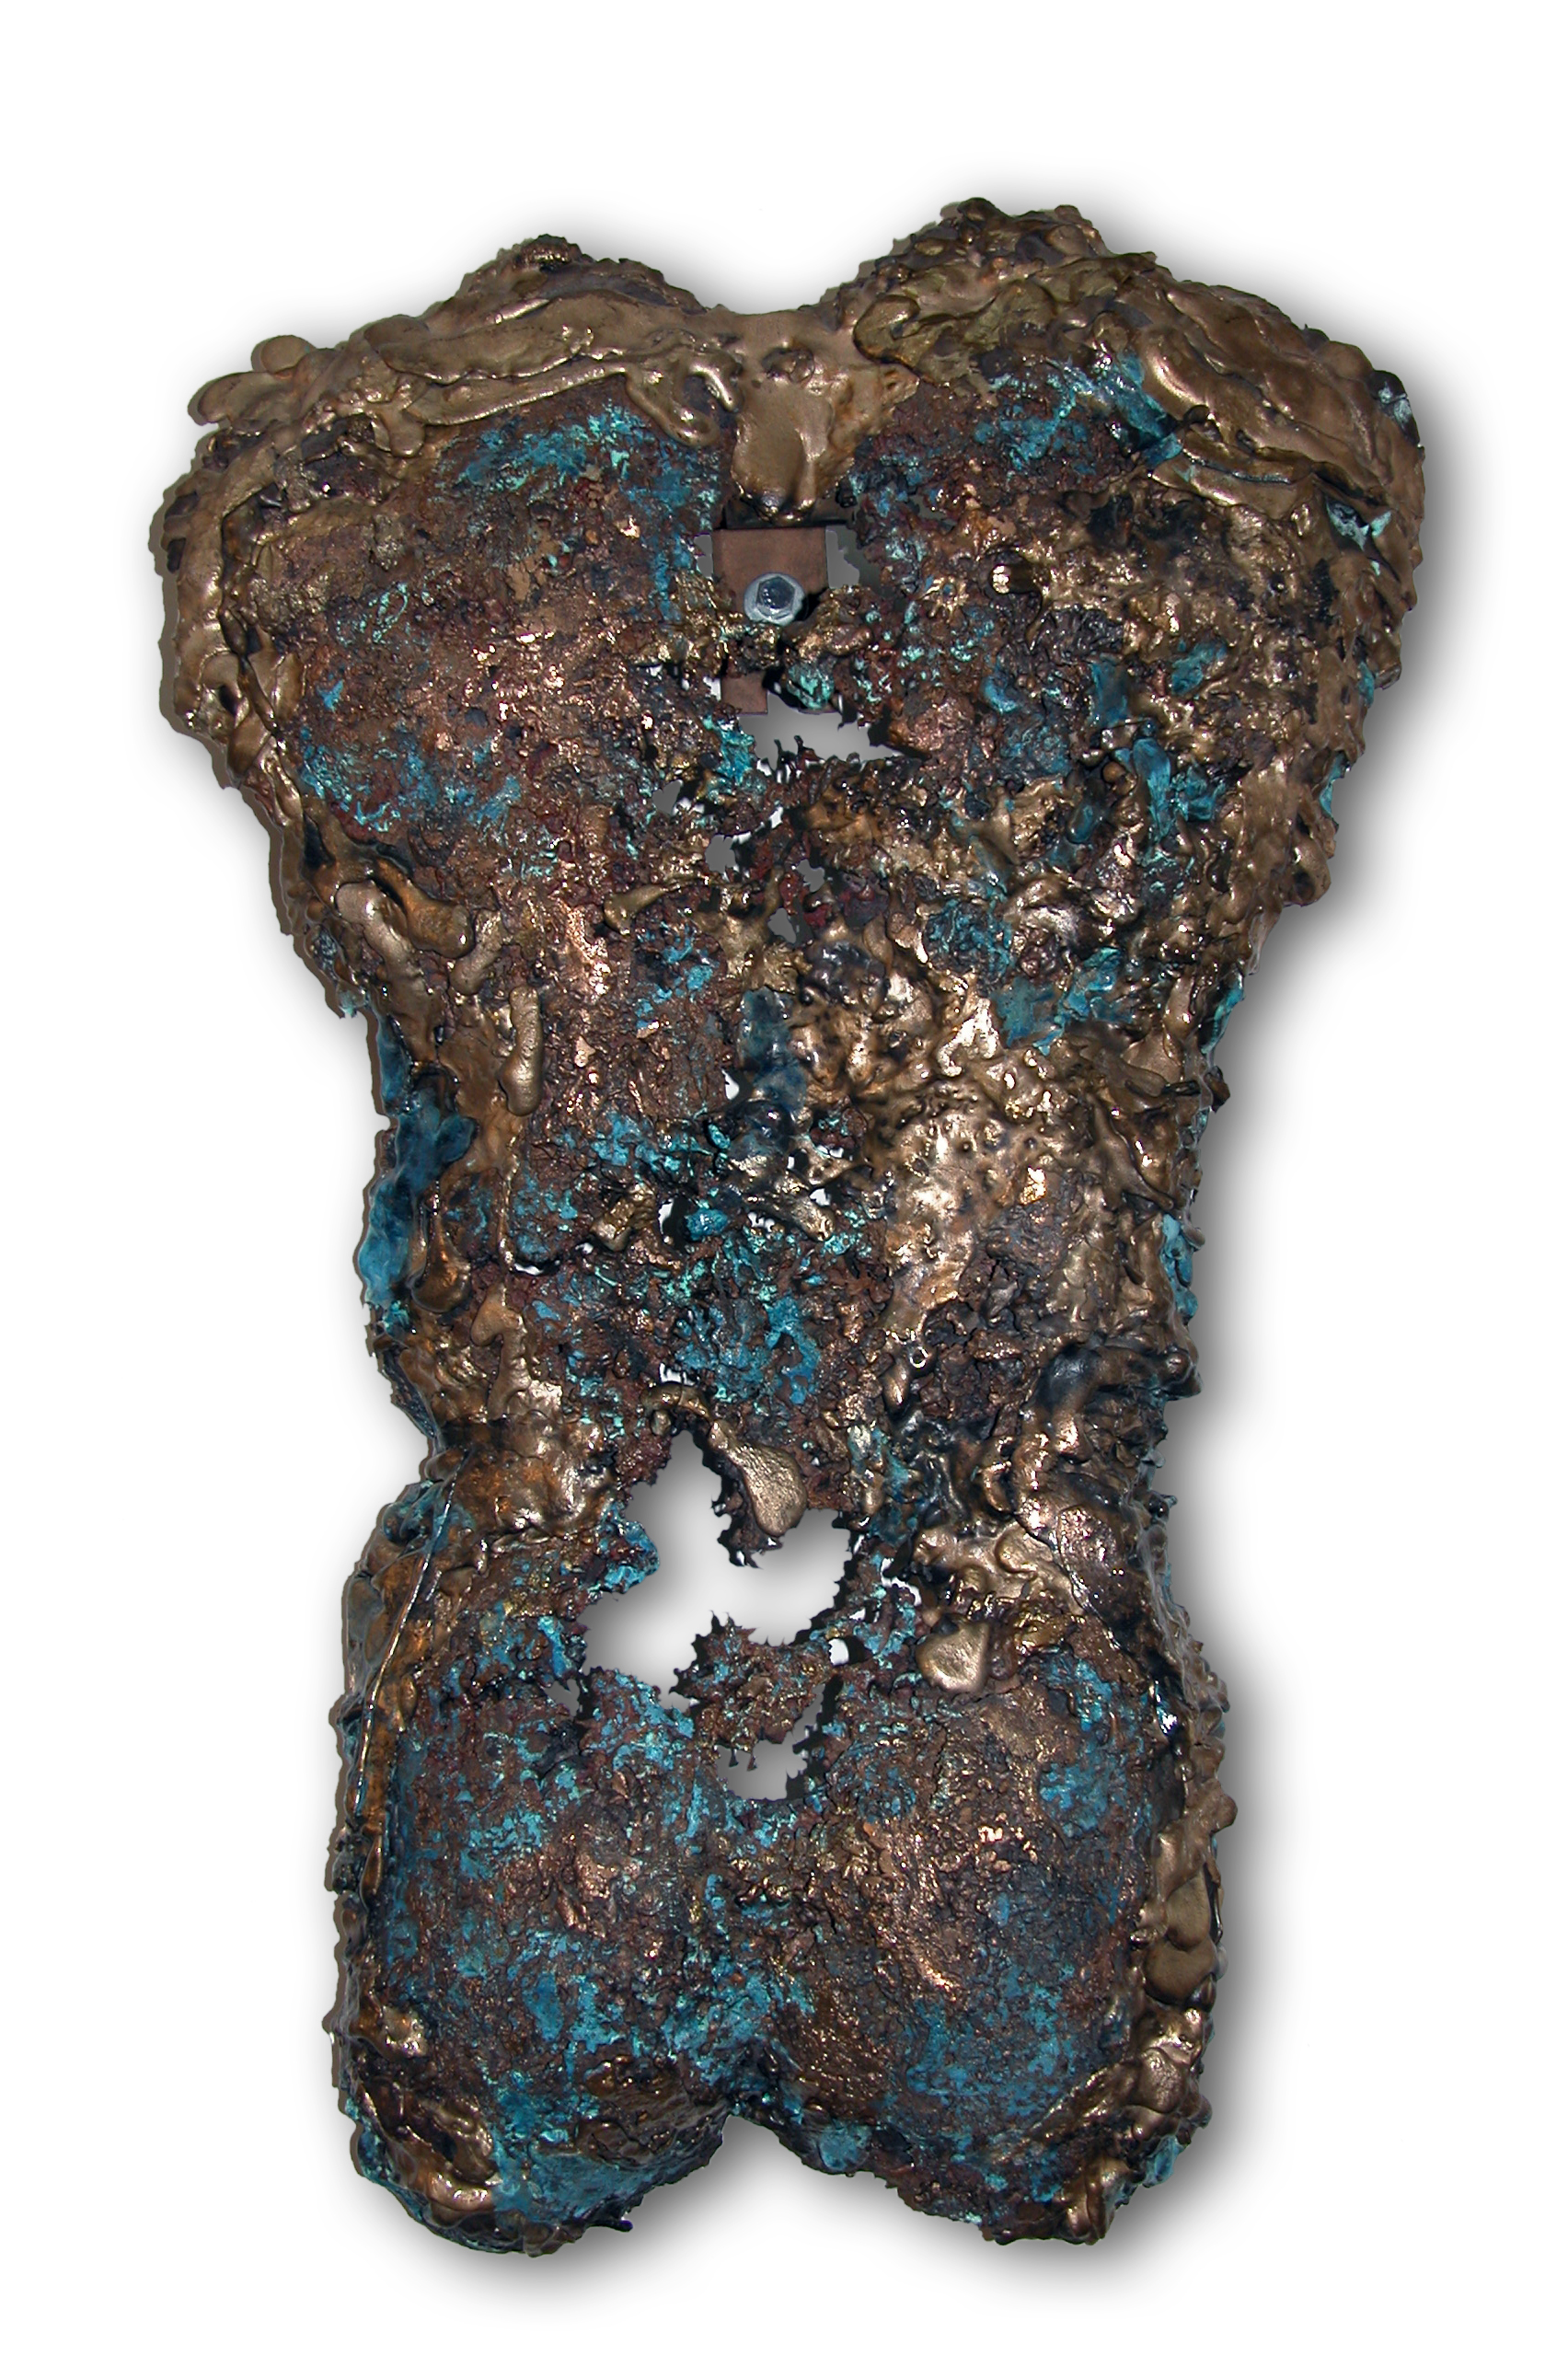 Eros V, 1999, Bronze, 33 x 19 x 4 inches Artist: Carole Feuerman